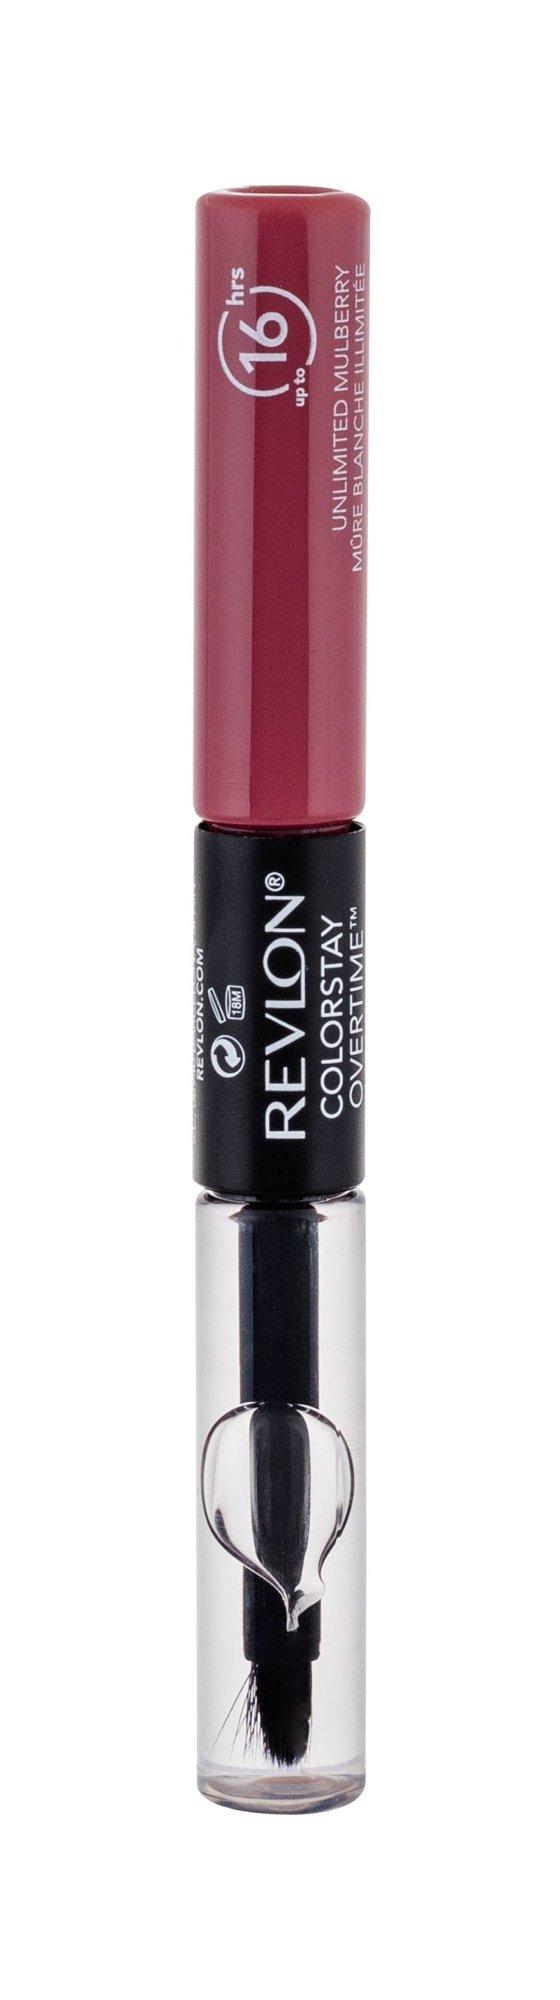 Revlon Colorstay Lipstick 4ml 220 Unlimited Mulberry